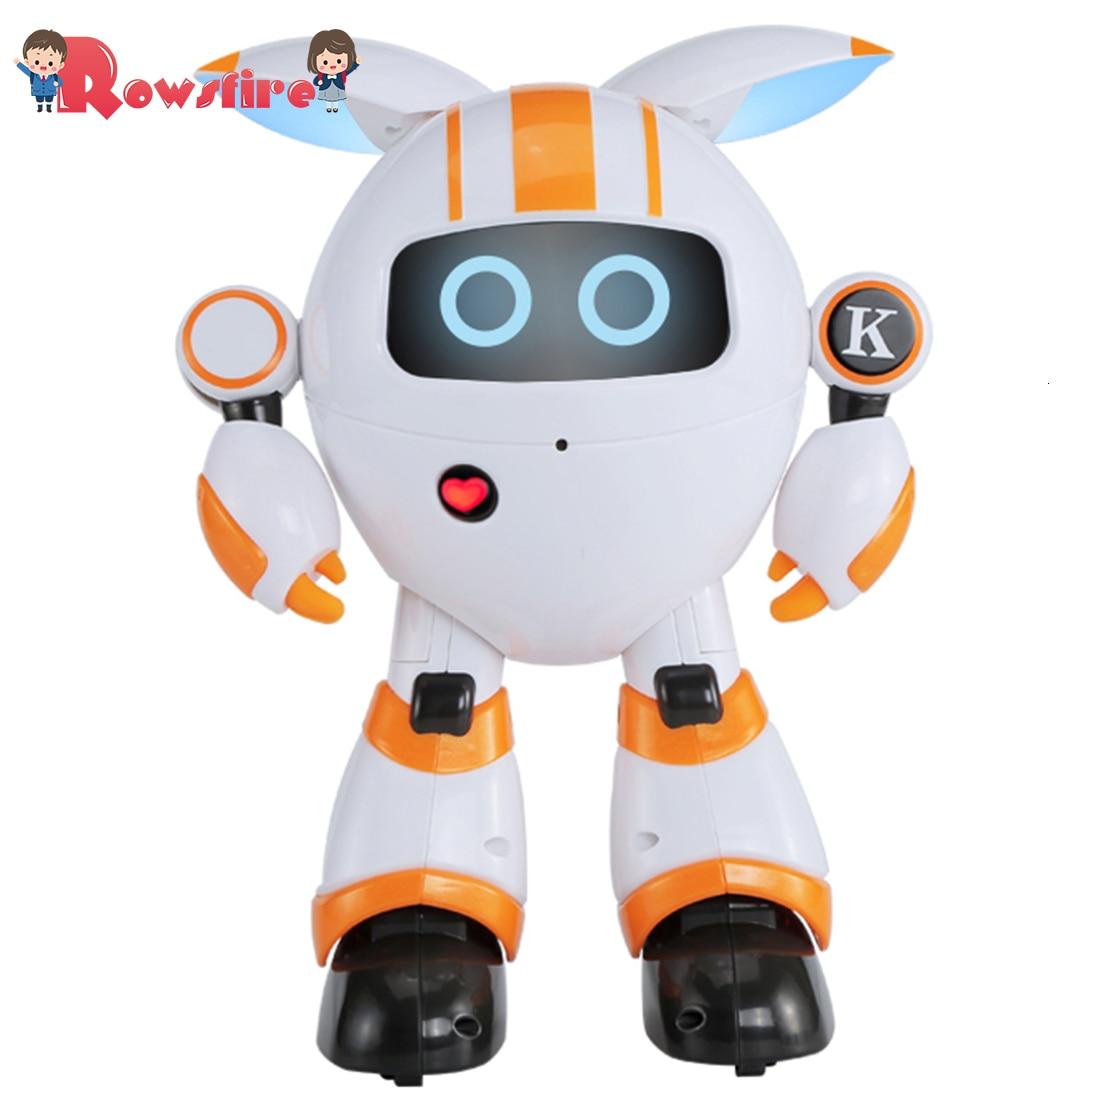 Rowsfire Smart Walking Robot RC Electronic Dancing Singing Robot Toy For Children - Orange/Blue